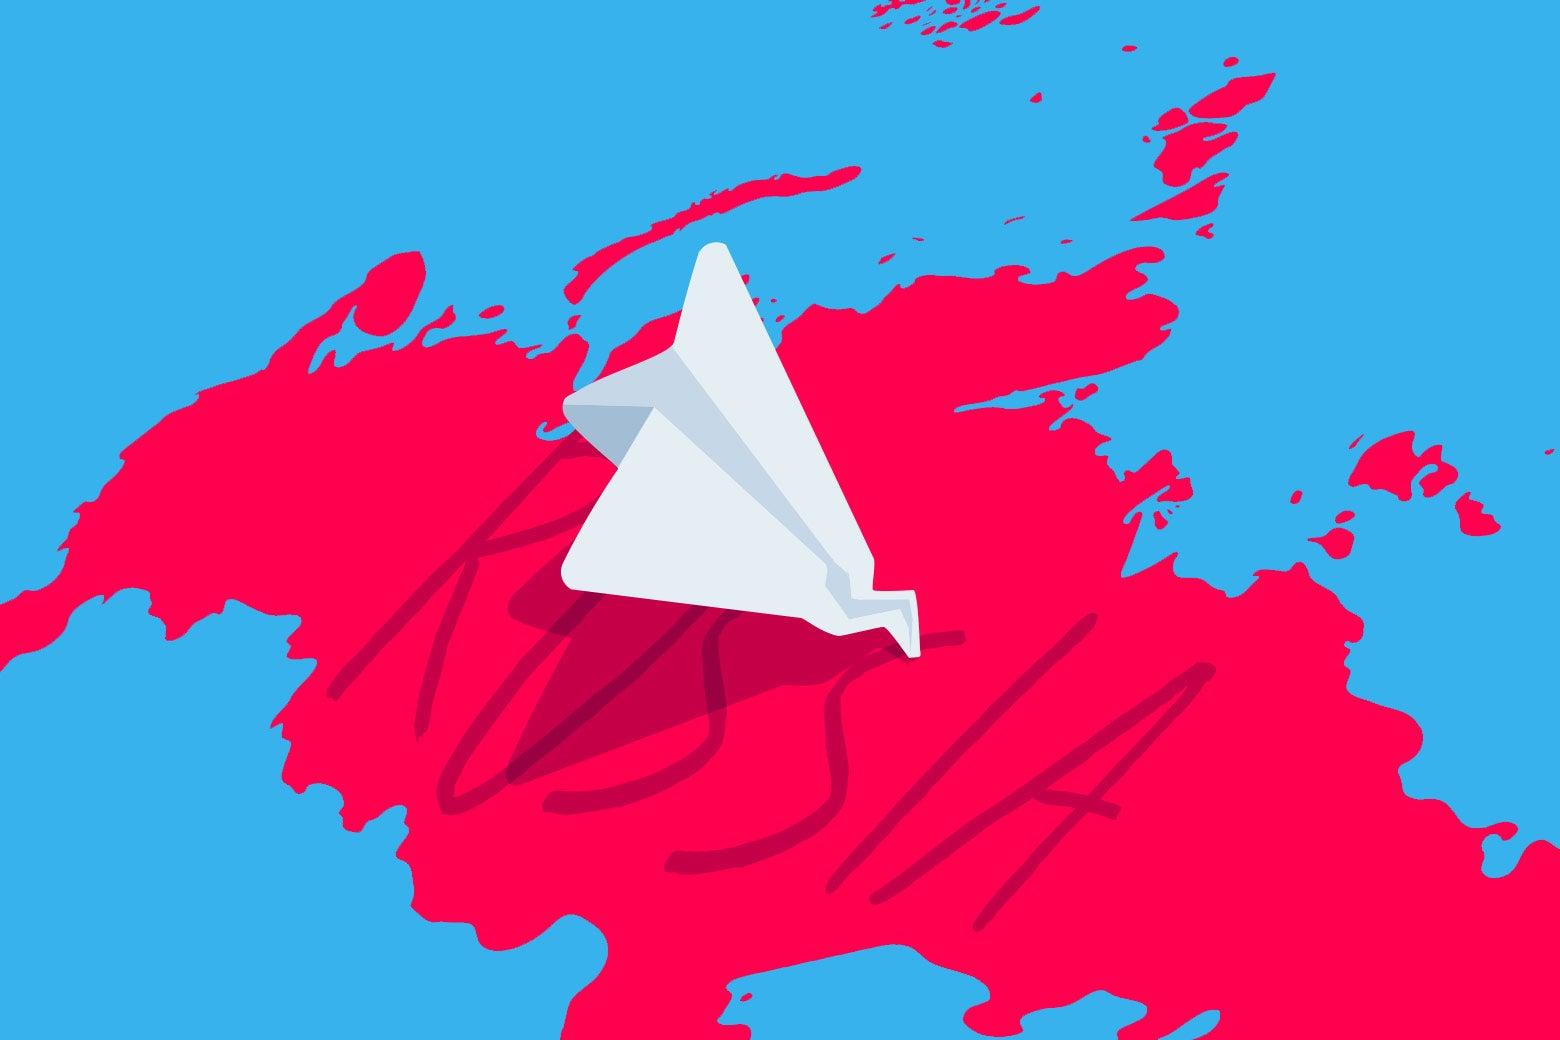 Telegram App logo crashing into Russia.